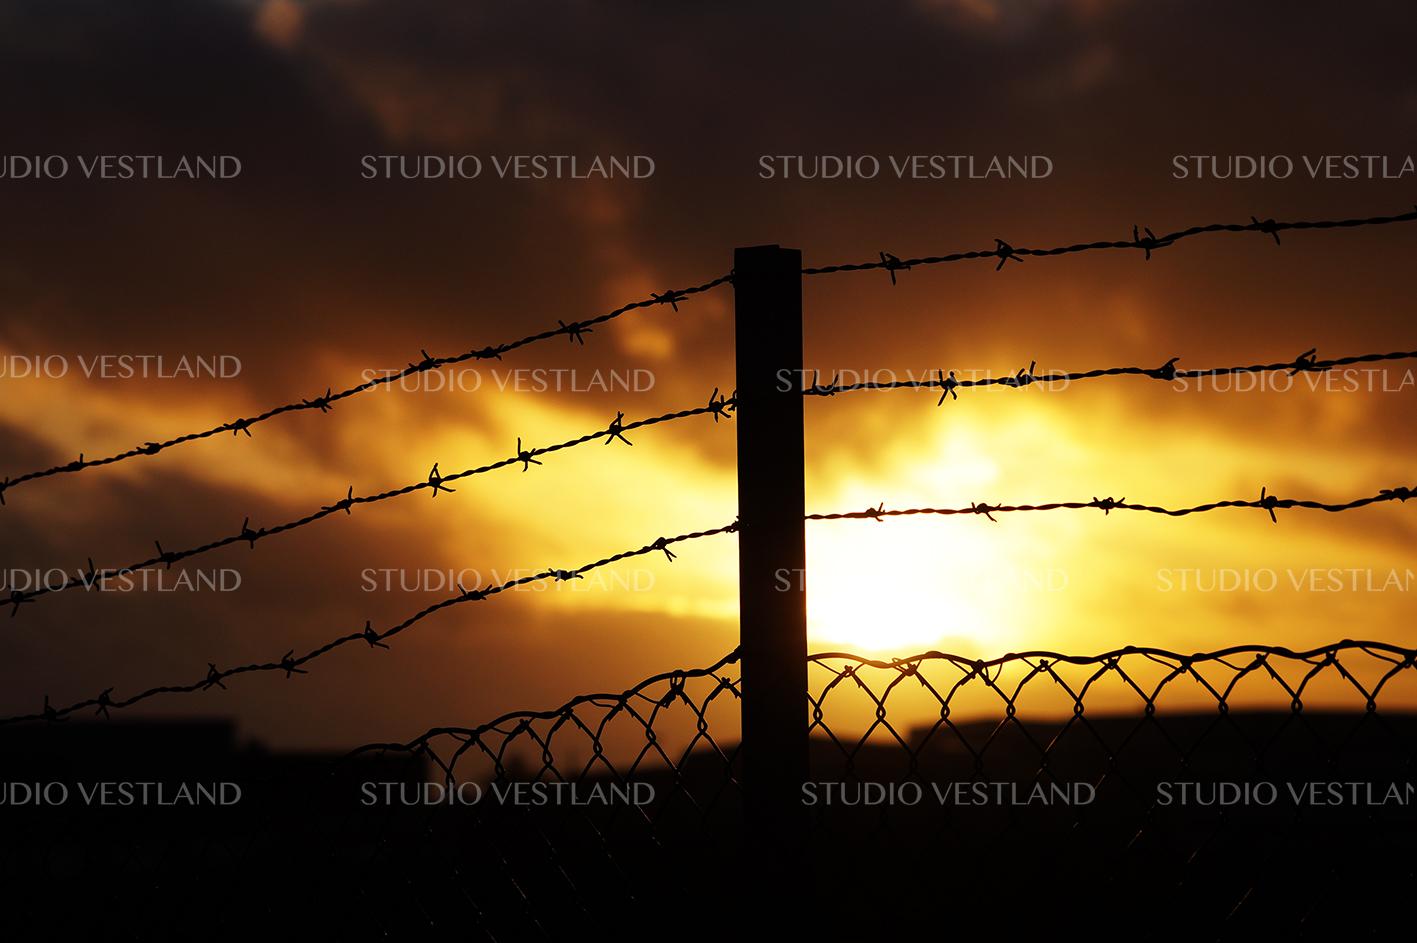 Studio Vestland - Gjerde 01